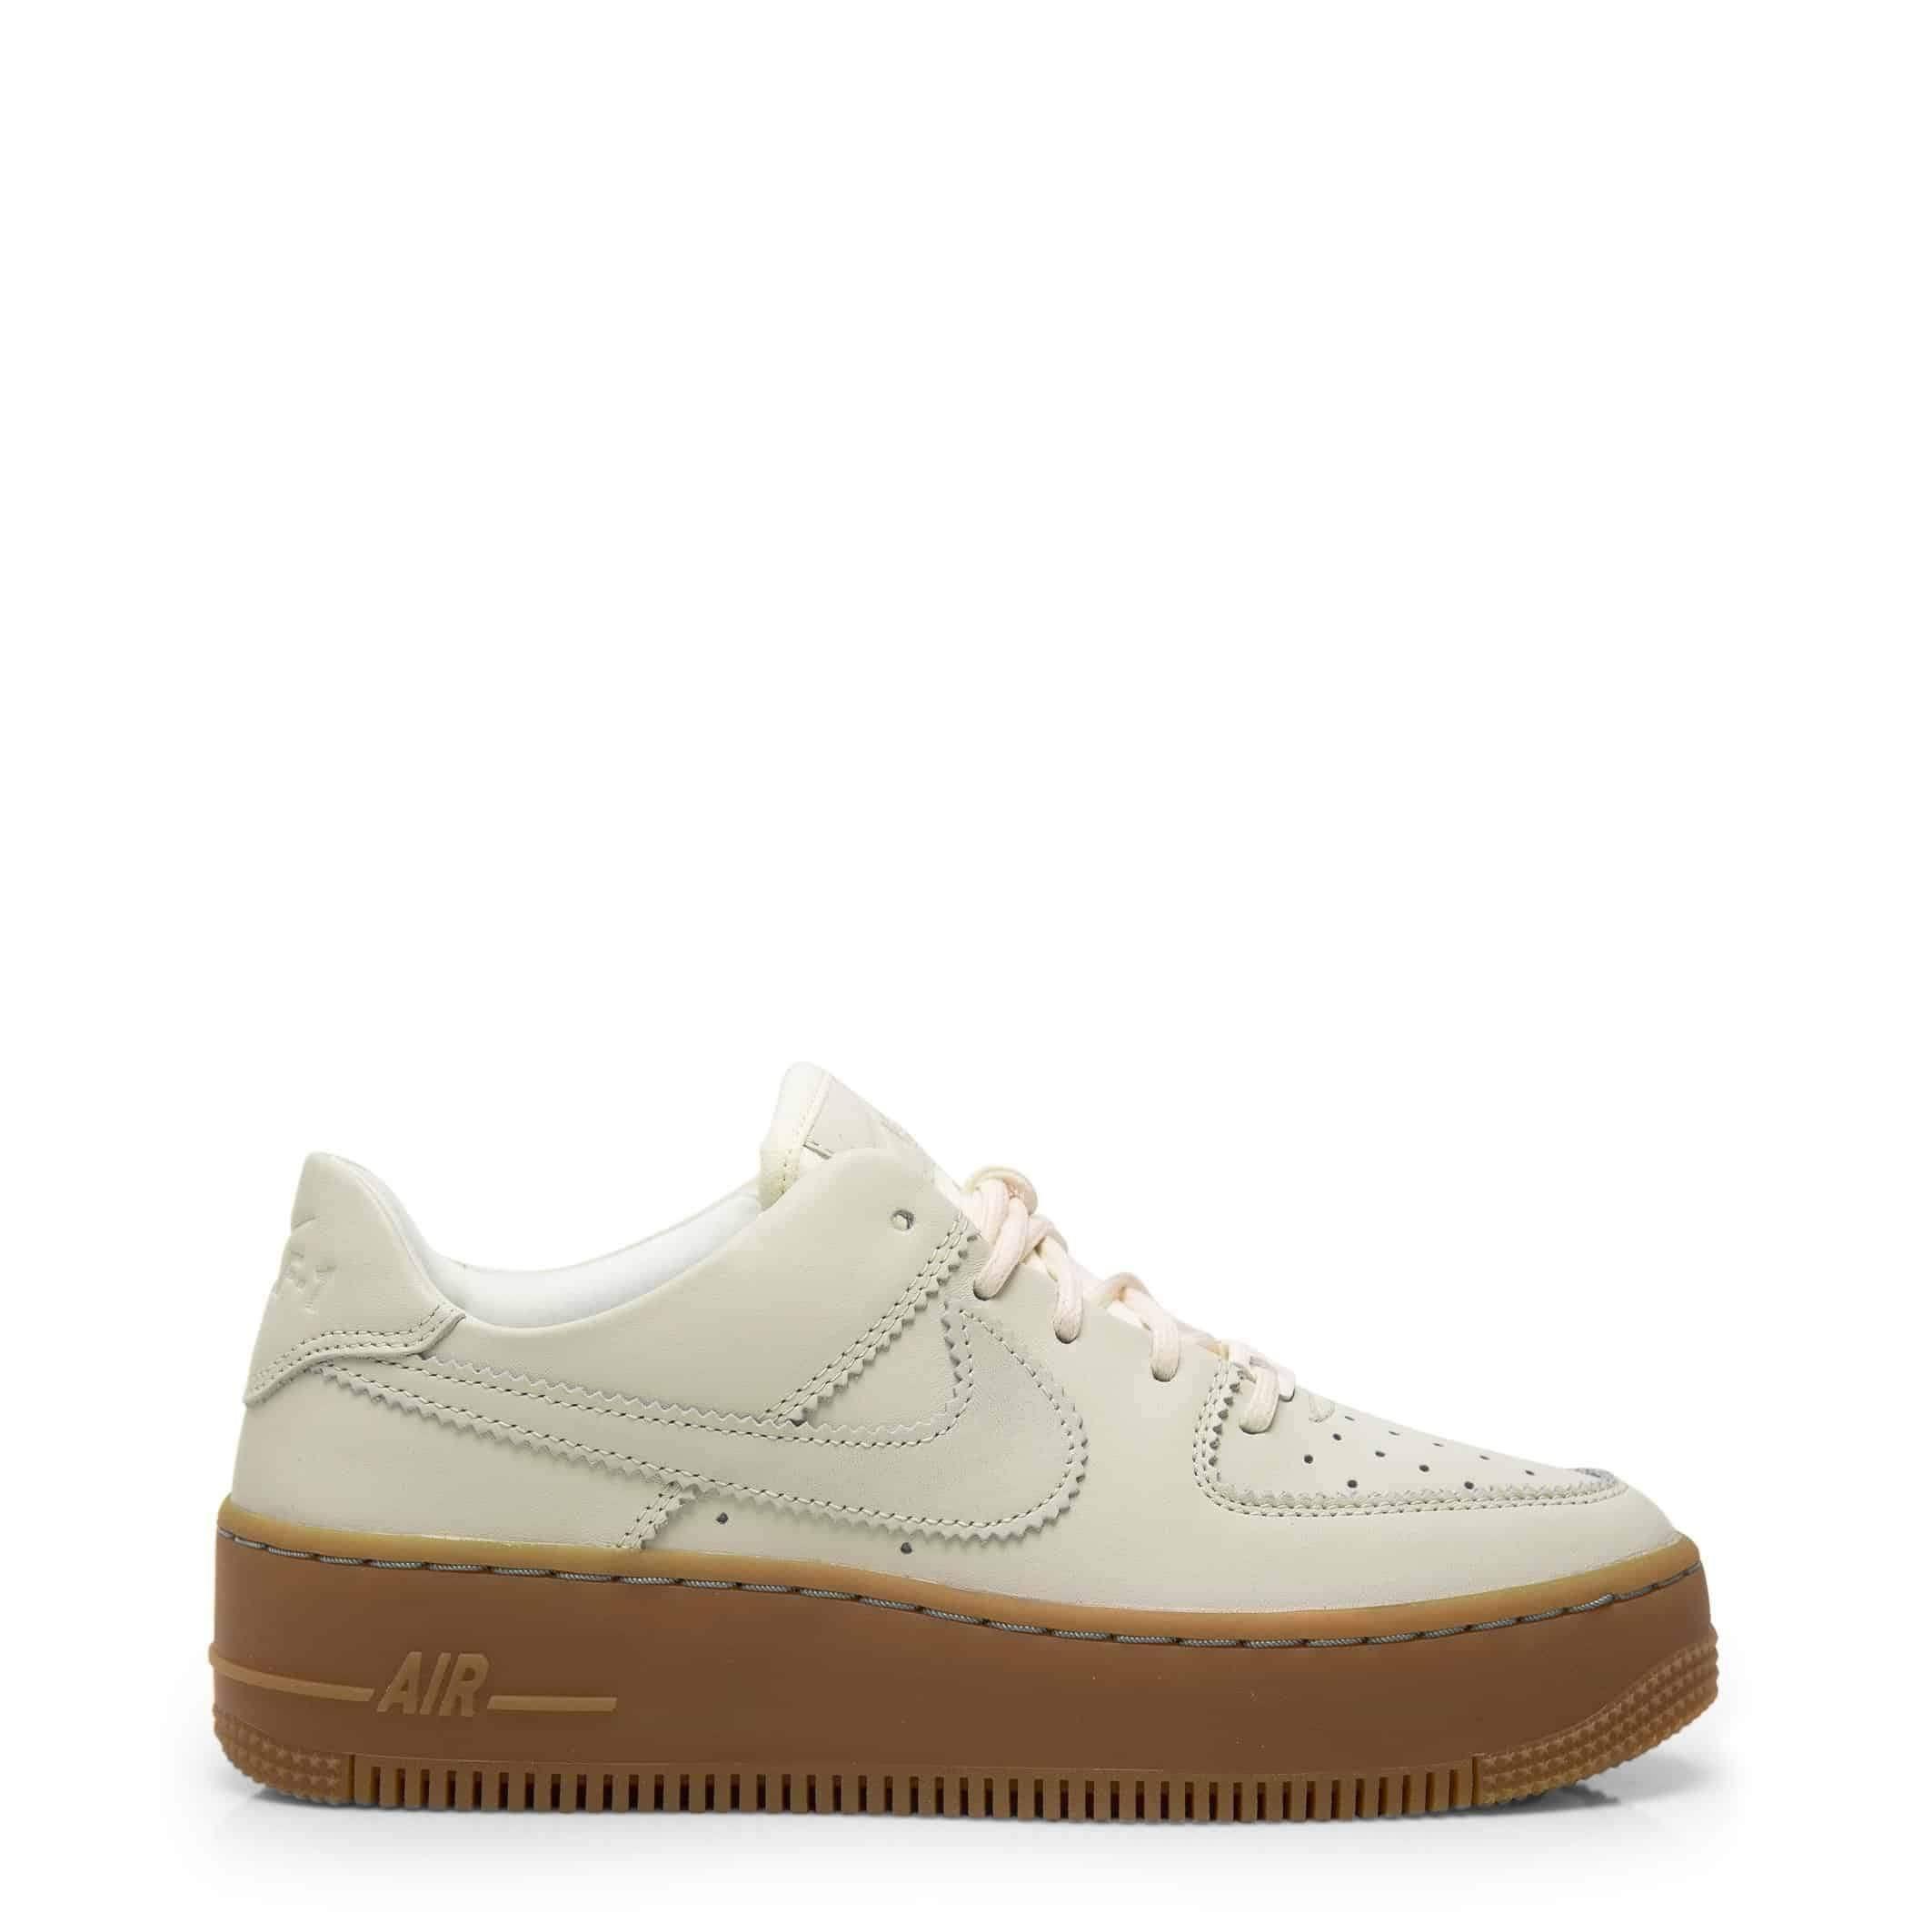 Nike Womens AF1 Sage LoWomens LX Shoes - Size 7.5W  v4PVXsI